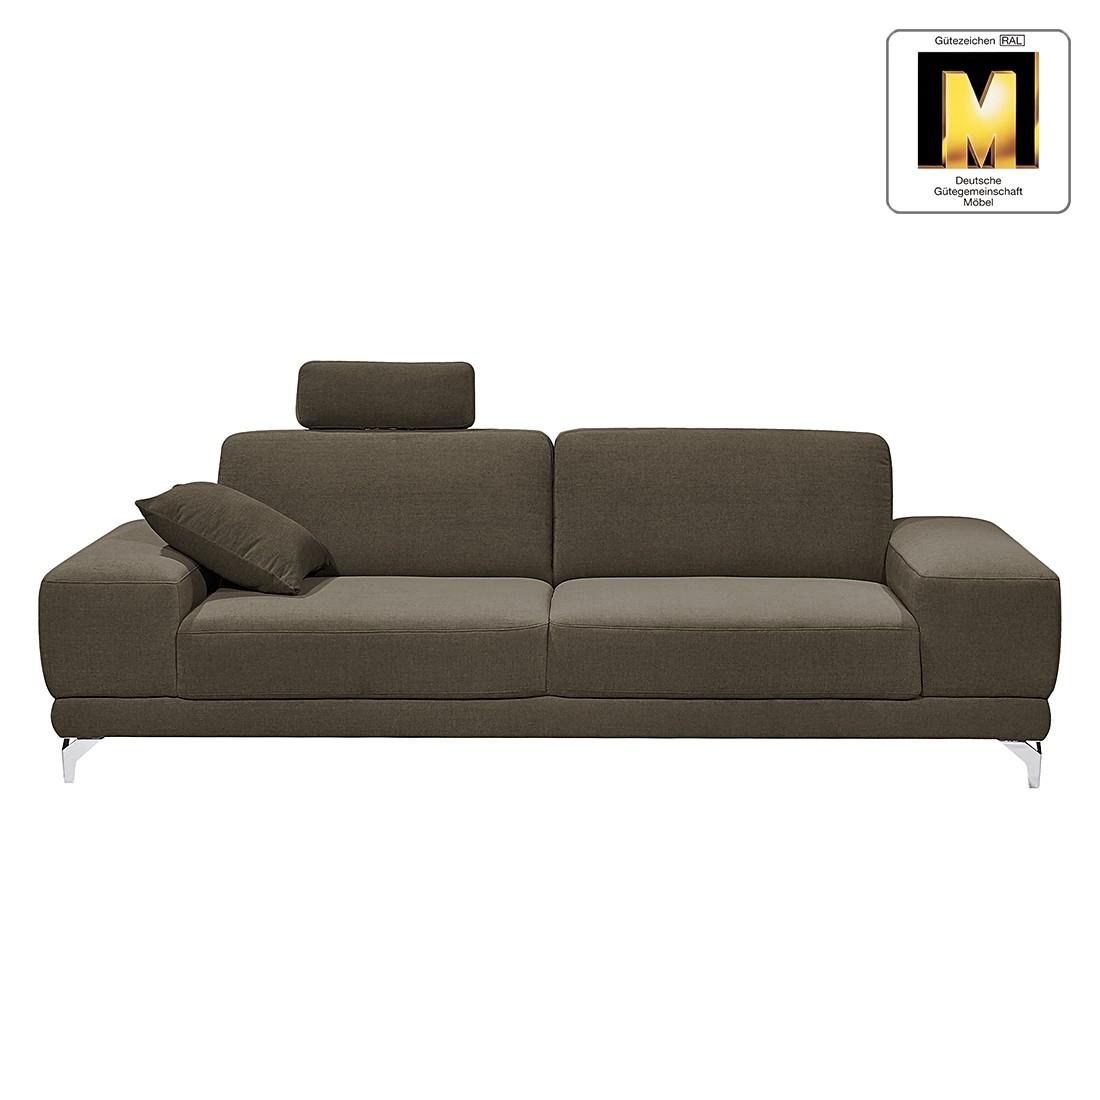 sofa casual line 3 sitzer velours keine funktion dunkelbraun claas claasen bestellen. Black Bedroom Furniture Sets. Home Design Ideas